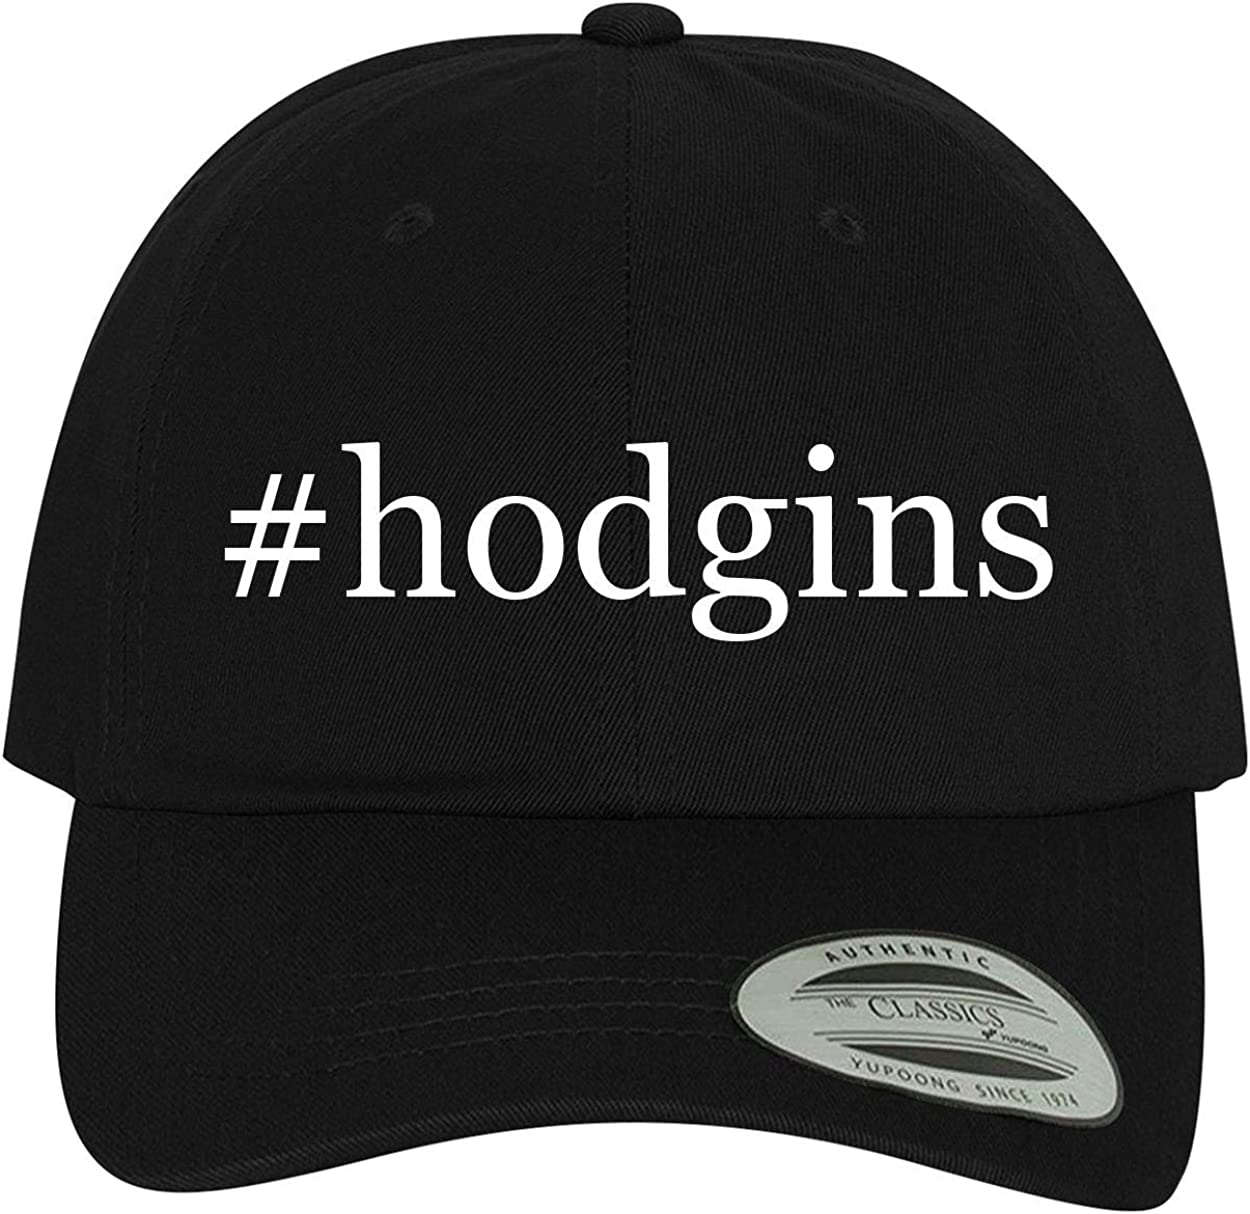 Comfortable Dad Hat Baseball Cap BH Cool Designs #Hodgins